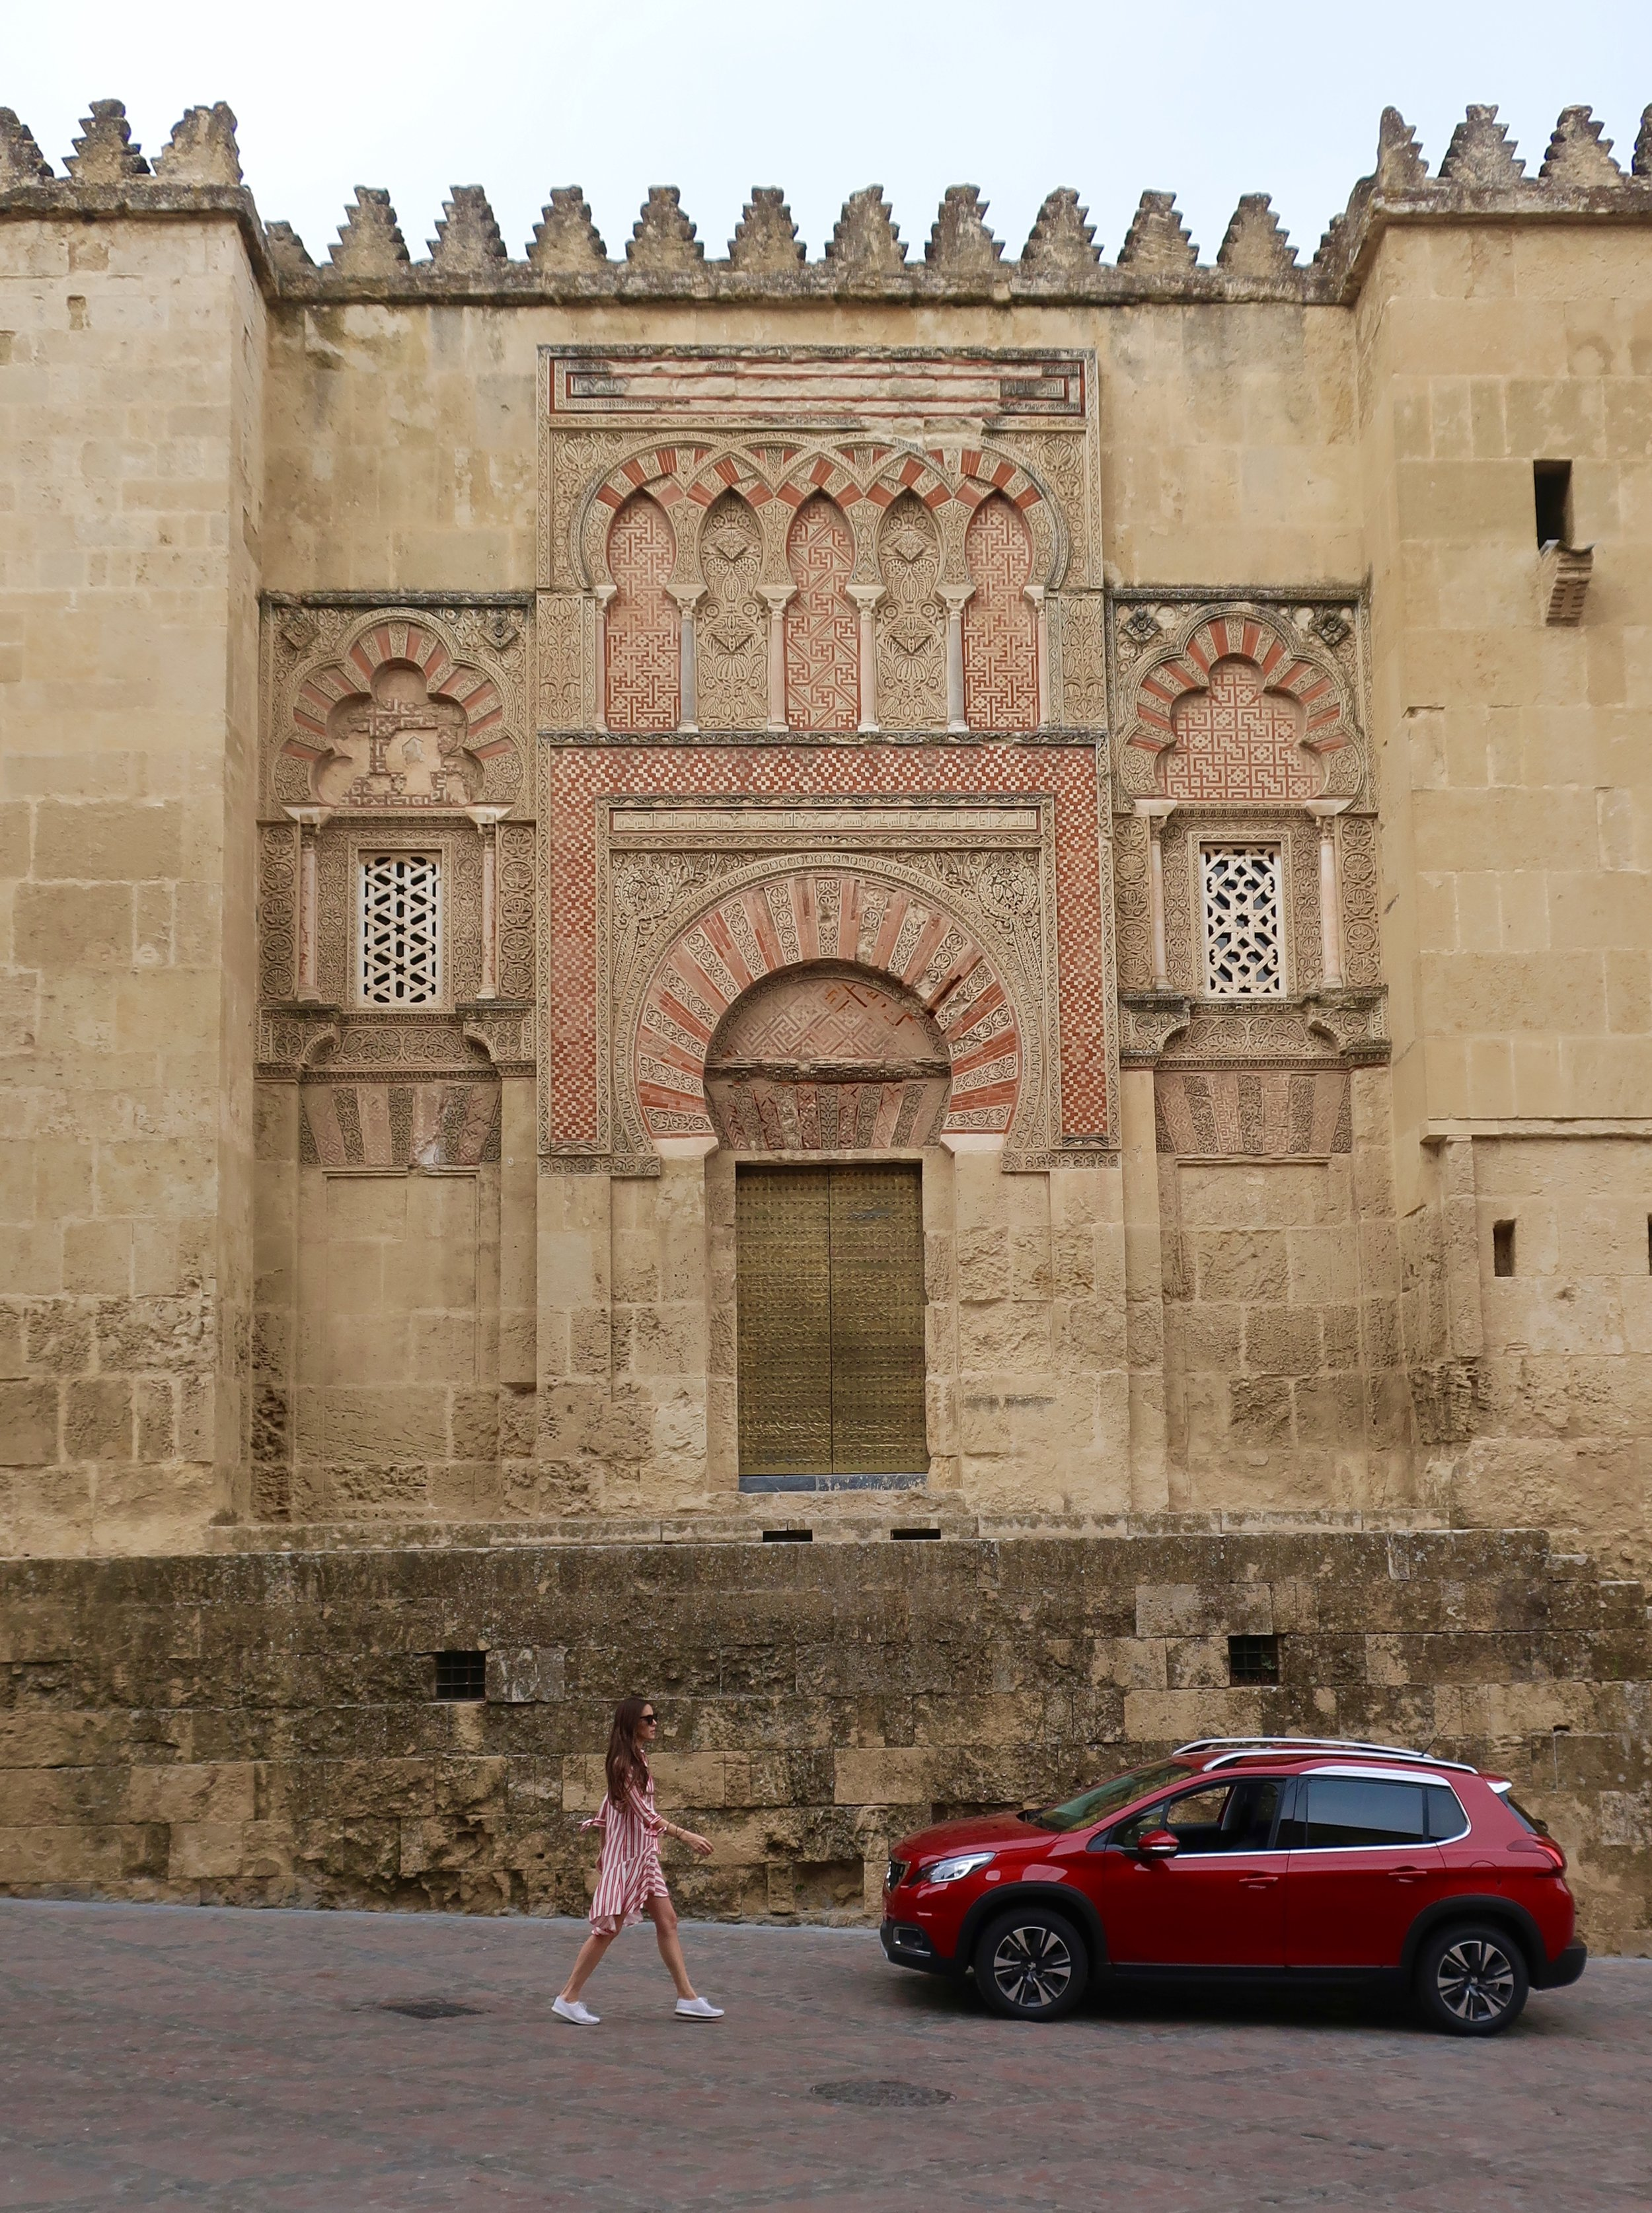 Exploring Córdoba on my road trip with AutoFrance